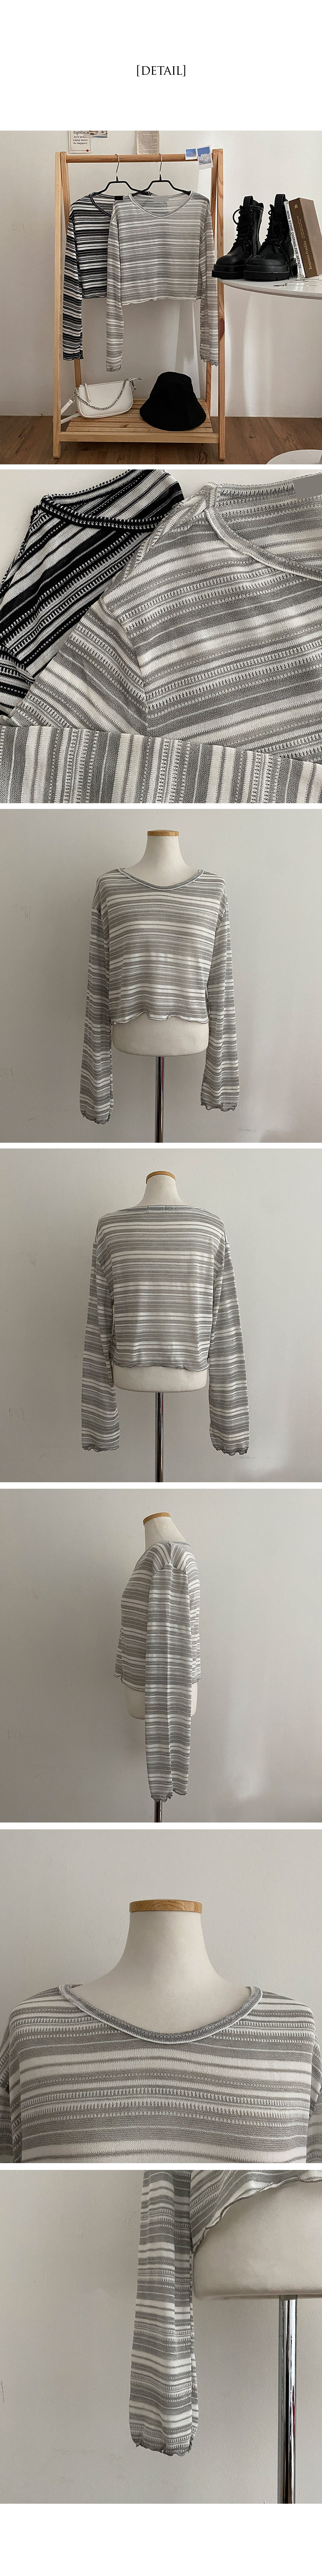 Yudeul Youdle Yuja Stripe Crop T-shirt